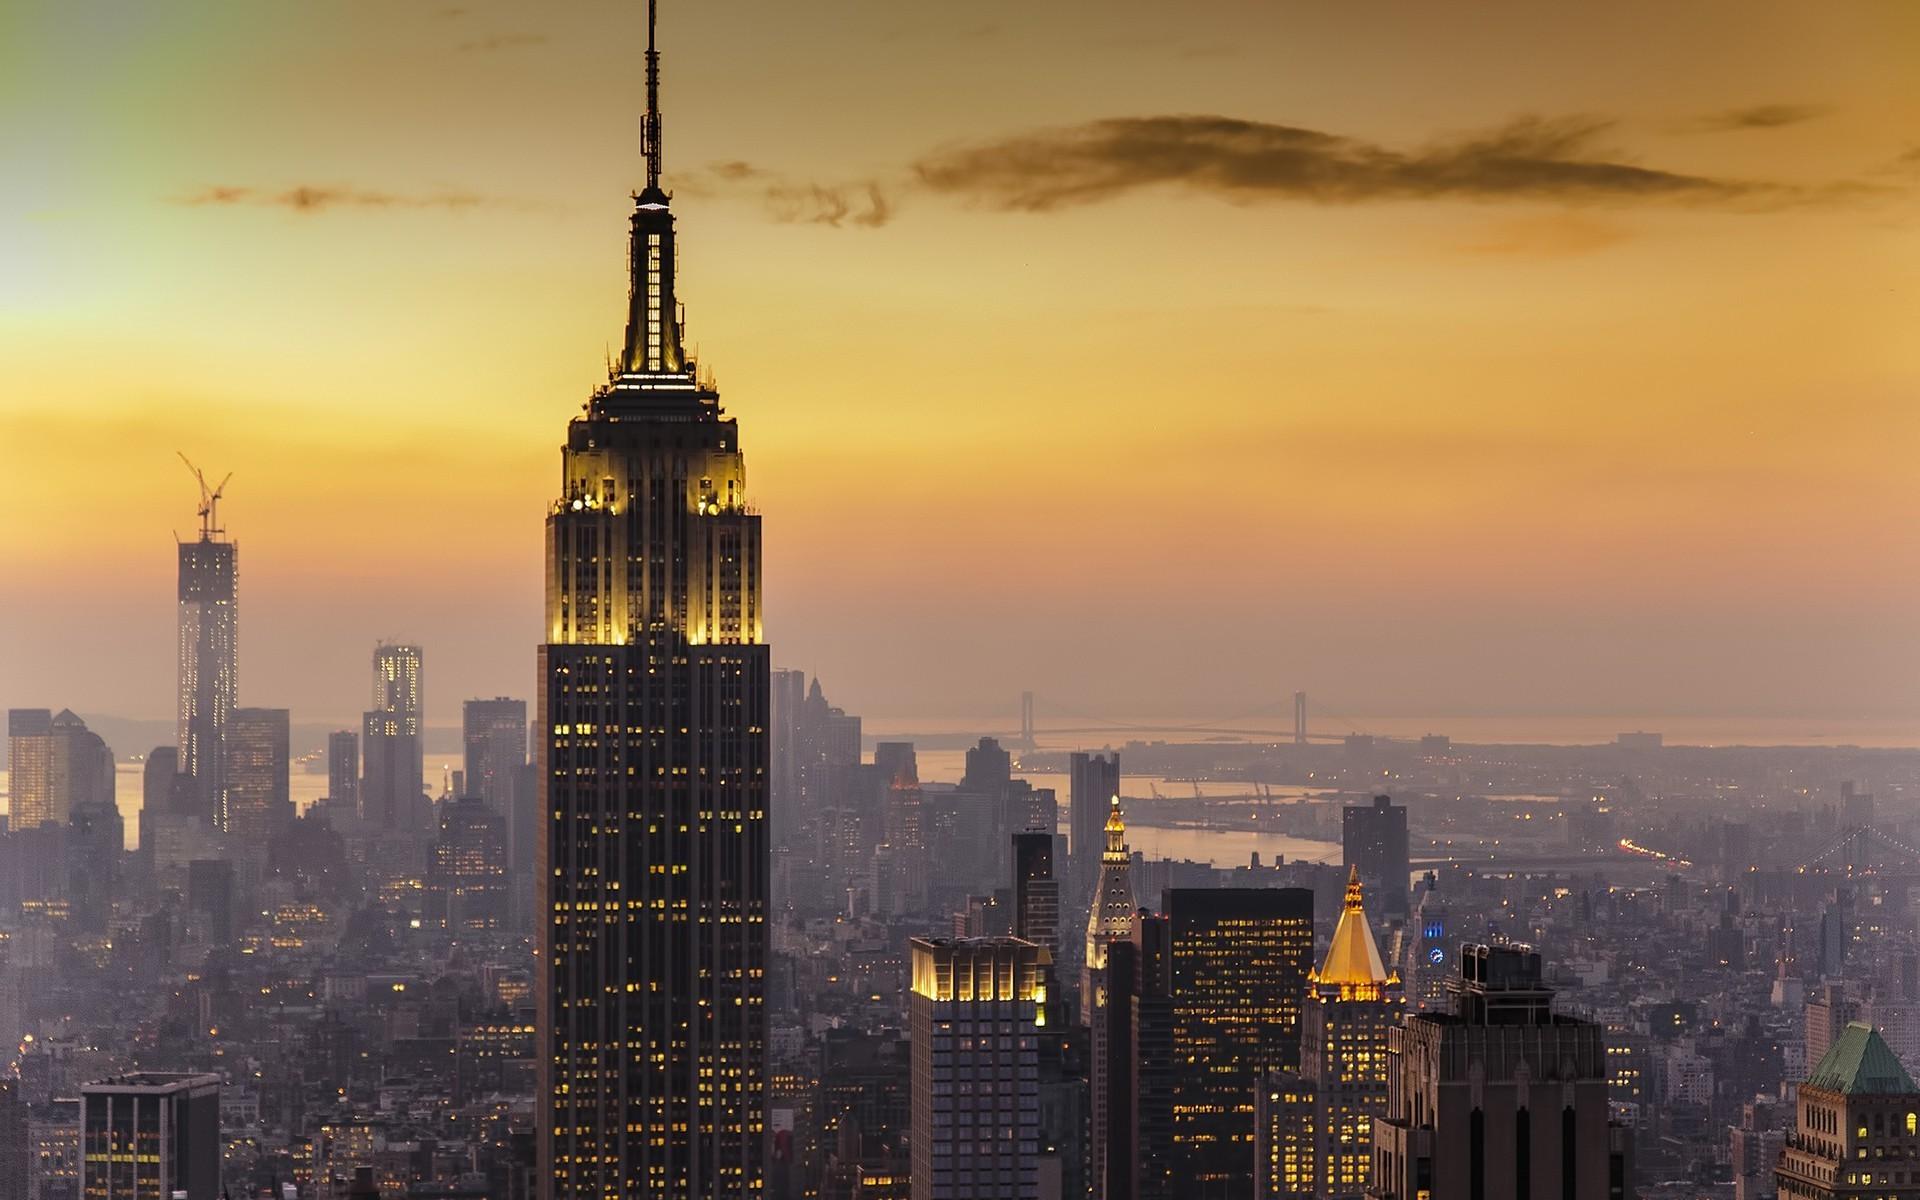 … New York City, USA, Birds Eye View, Lights, Sunset, River, Cranes  (machine), Clouds, Bridge Wallpapers HD / Desktop and Mobile Backgrounds